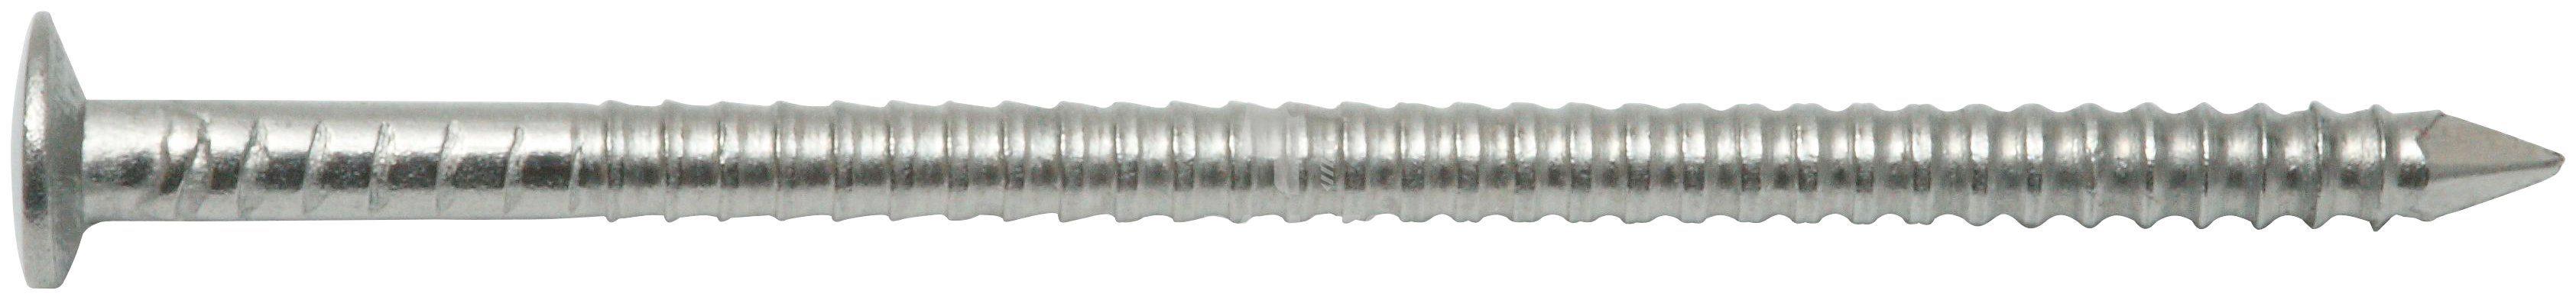 RAMSES Nagel , Linsenkopfnägel Senkkopf 1,9 x 35 mm Edelstahl A2